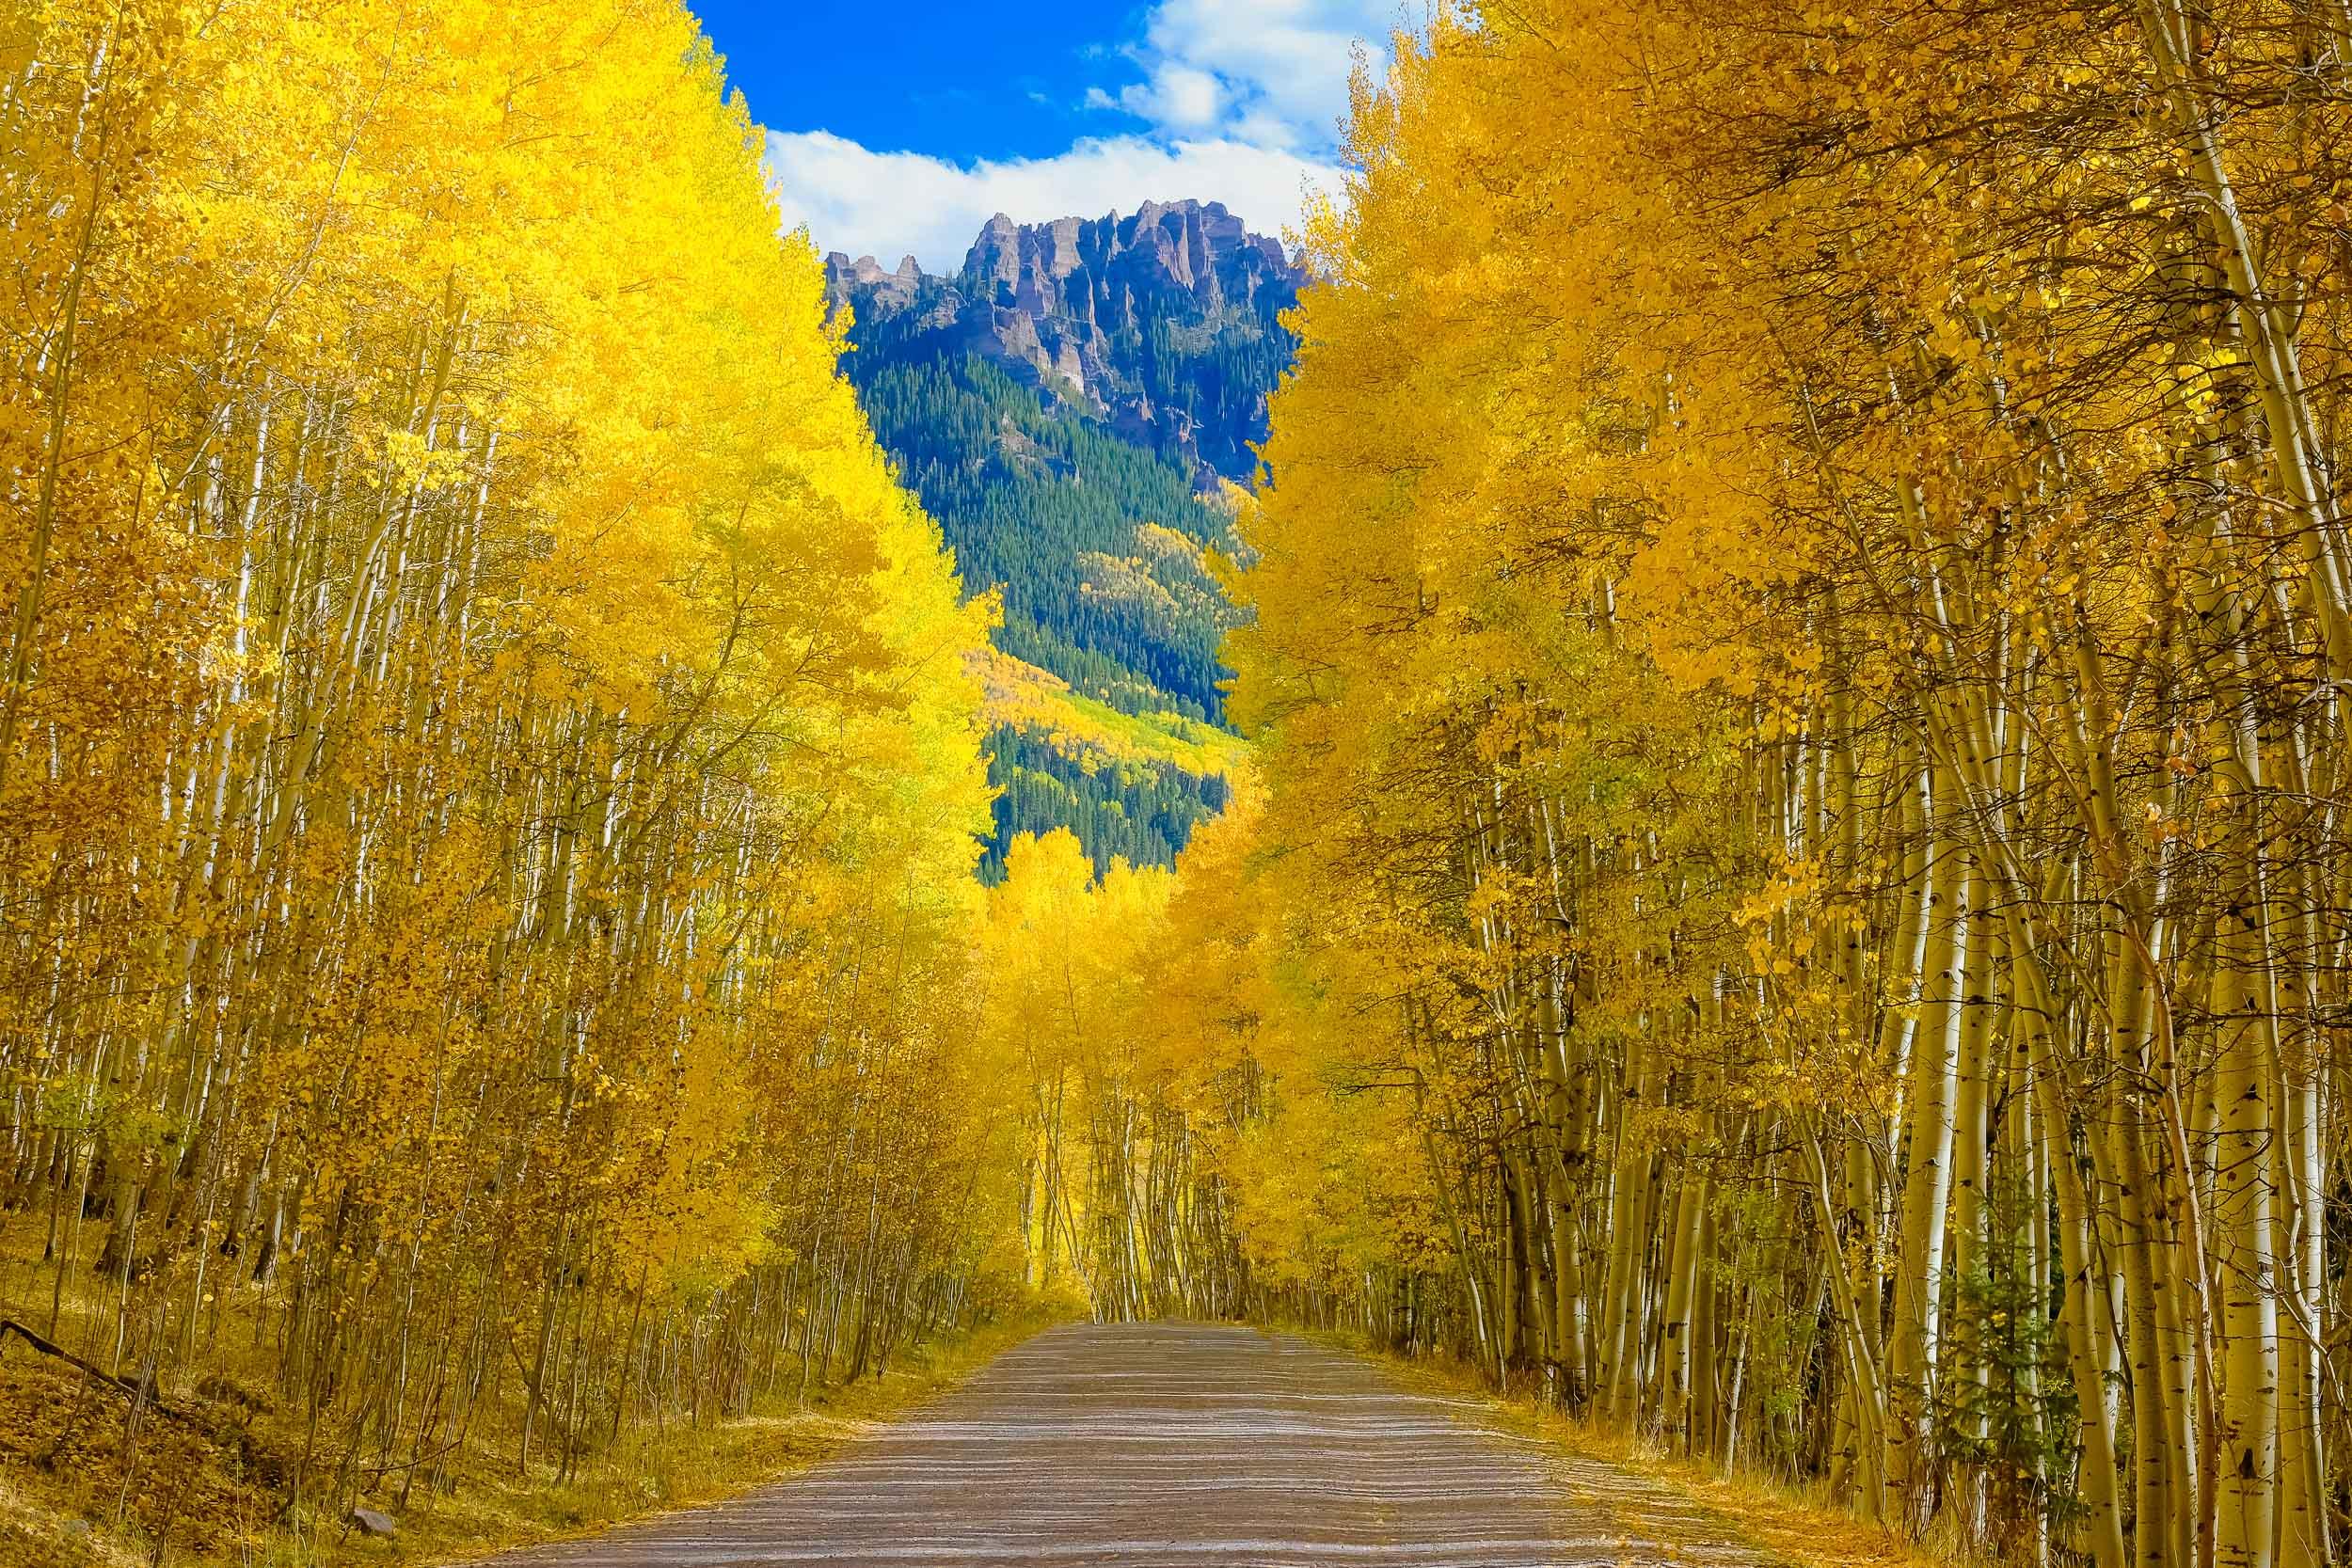 Owl Creek Pass along the Cimmaron Mountain Range during the fall season - Fuji X-T2, XF 50-140mm f/2.8 @ 50mm